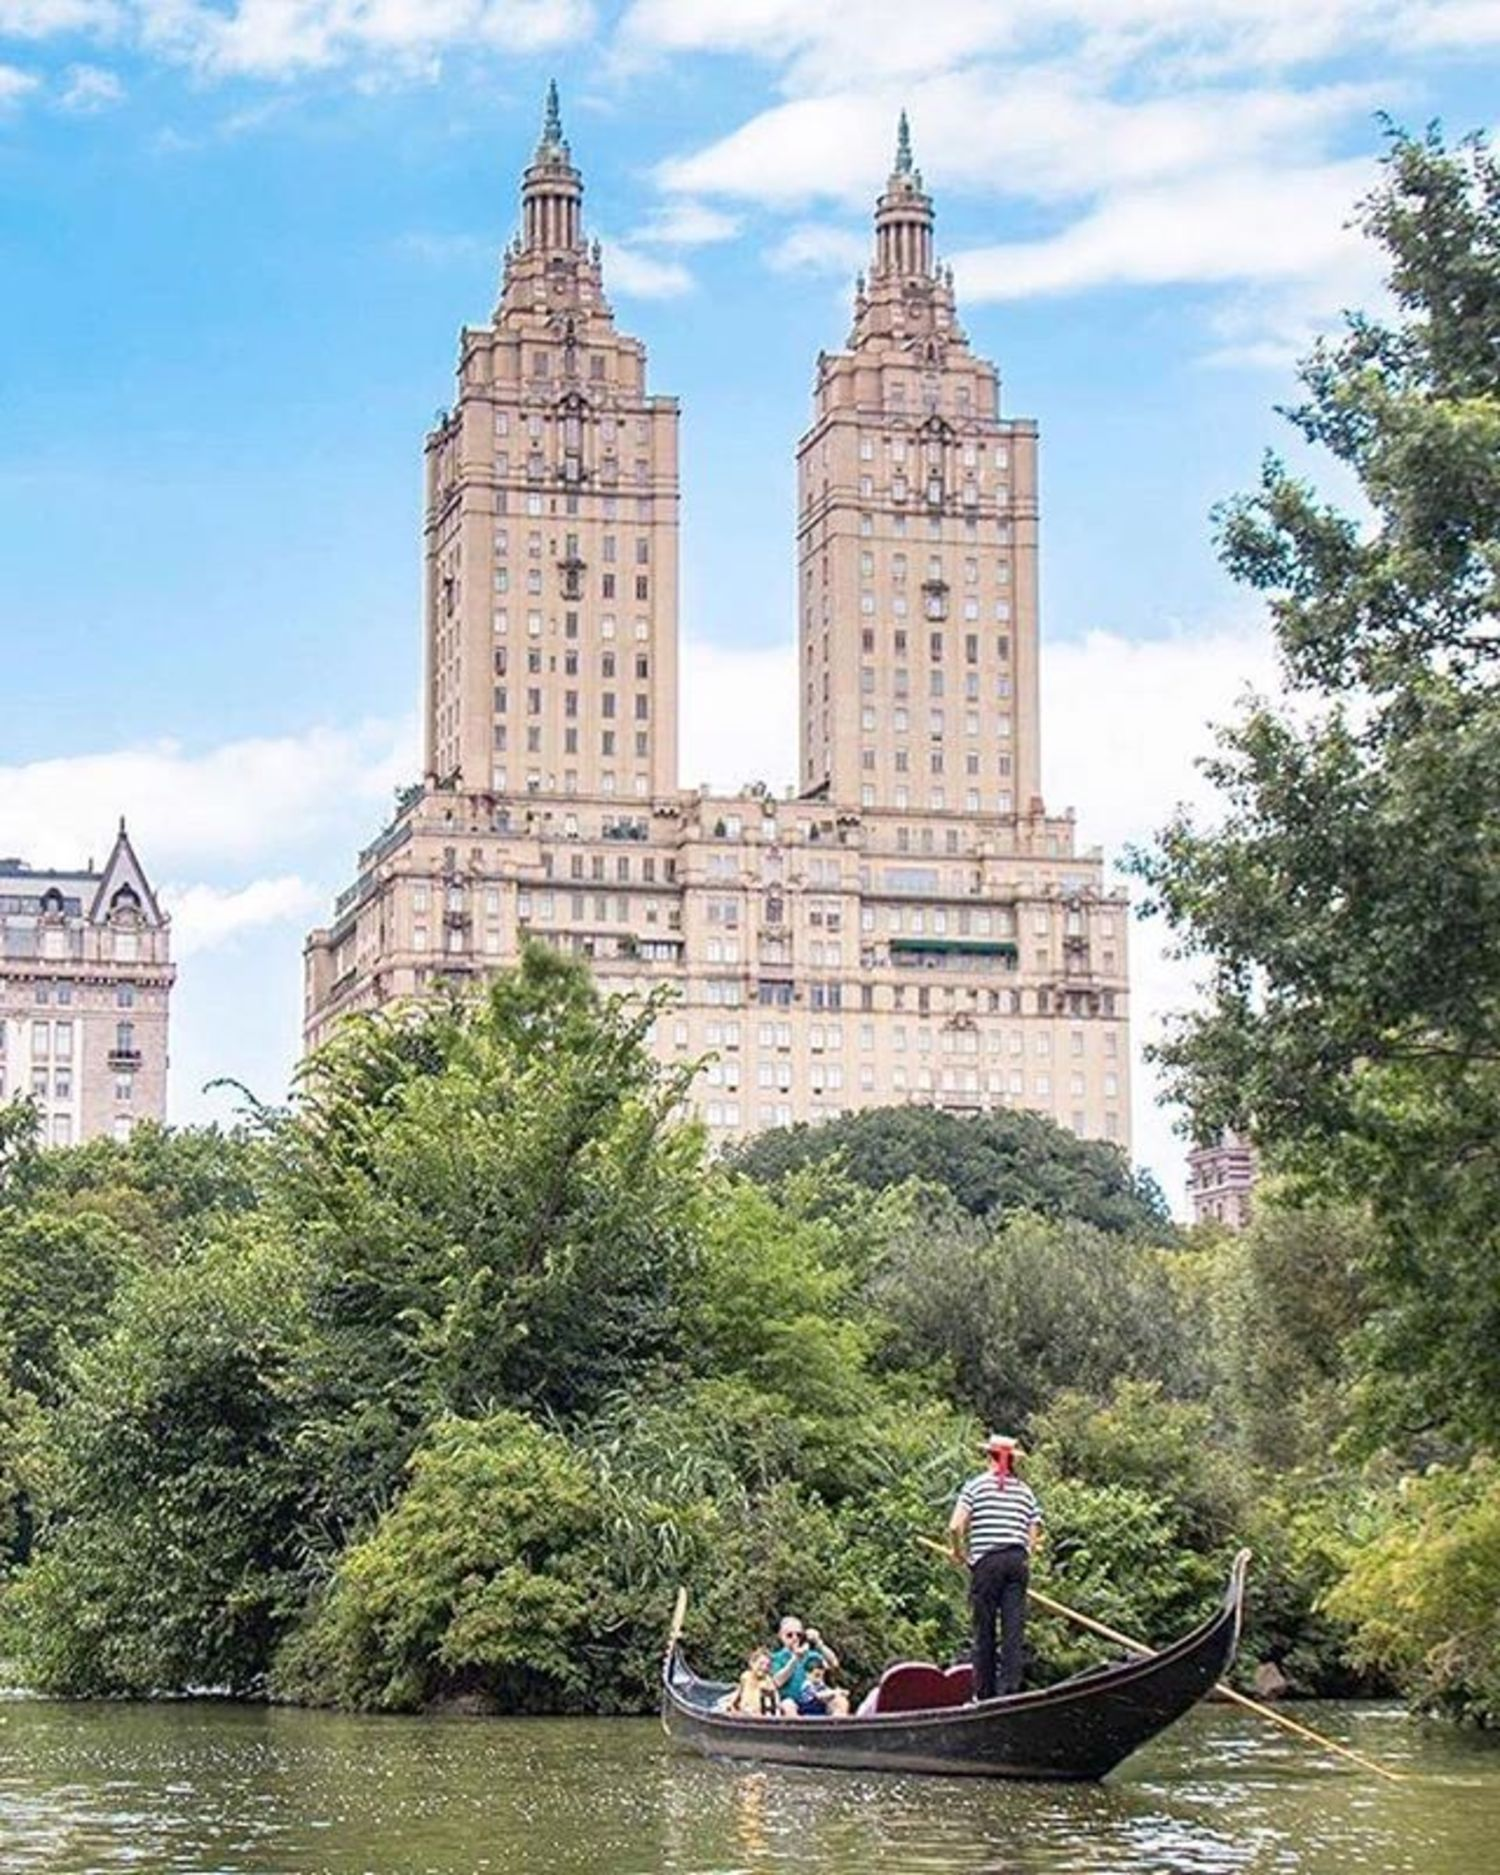 Central Park Lake, New York City. Photo via @newyorkcitykopp #viewingnyc #newyorkcity #newyork